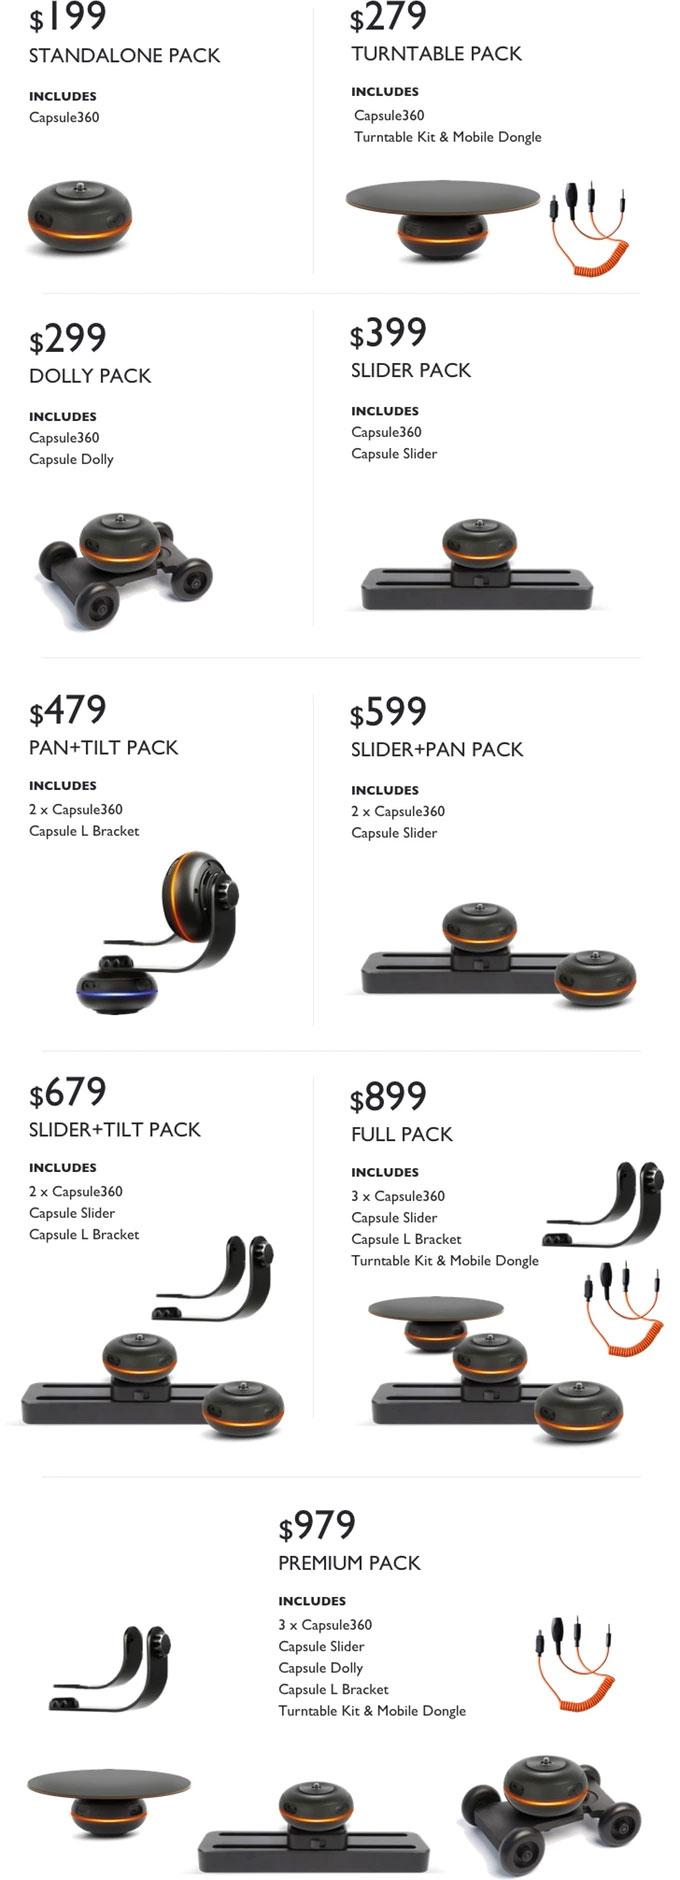 capsule360-kickstarter-cost